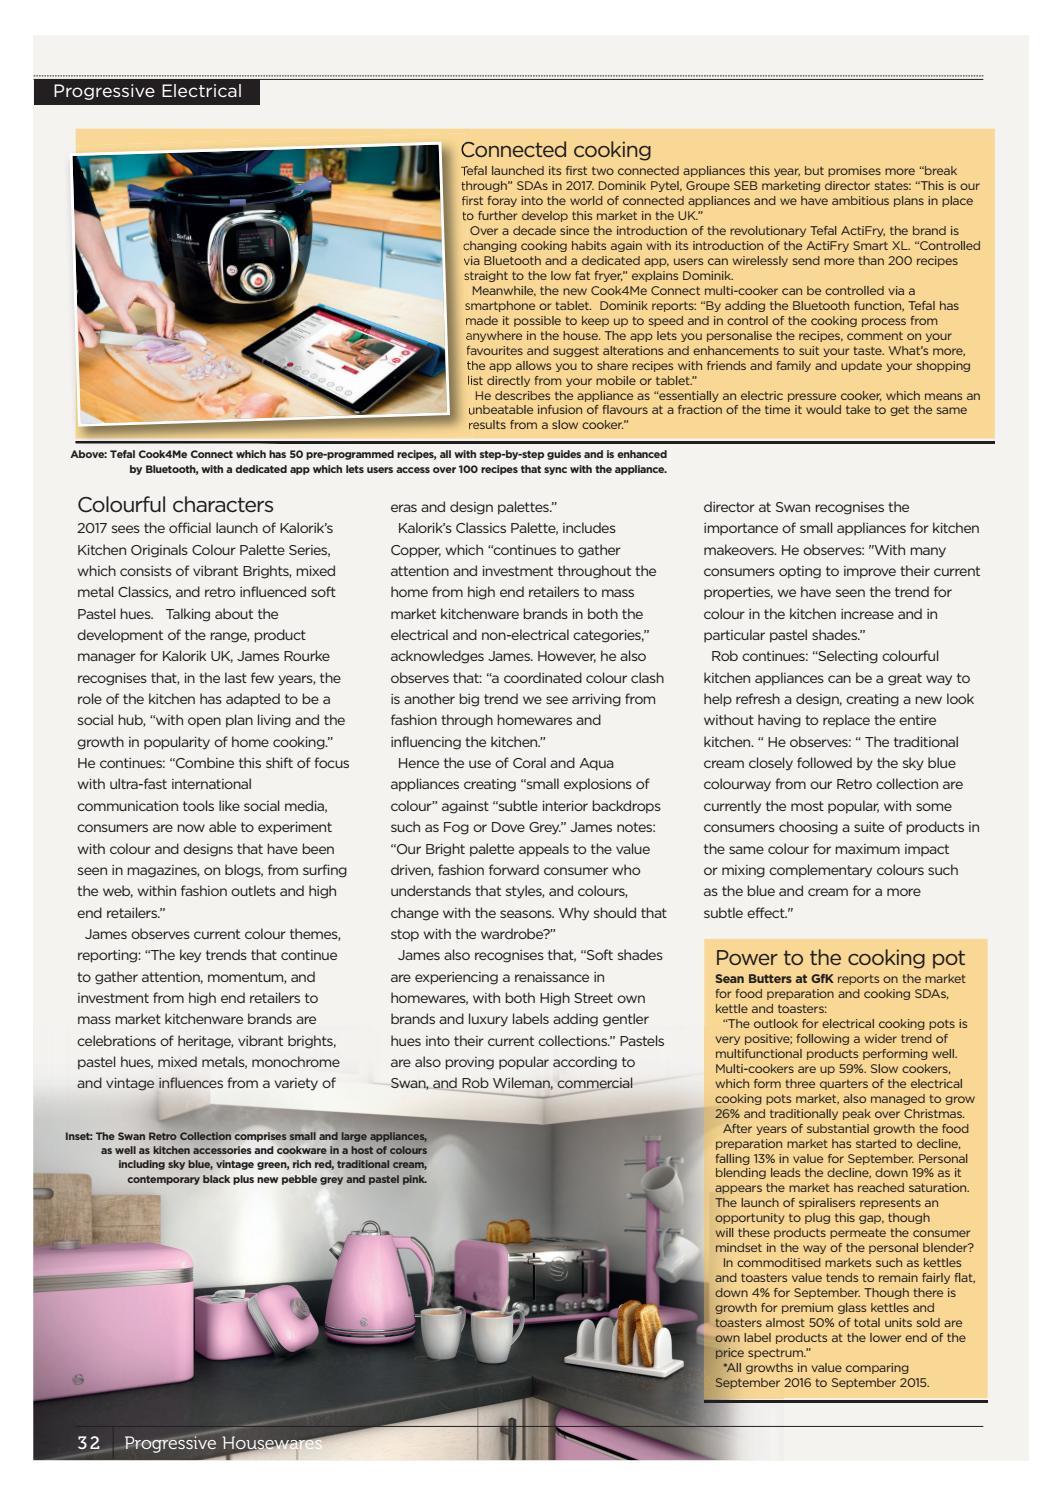 d2d169e7790 Progressive Housewares November December 16 by Max Publishing - issuu